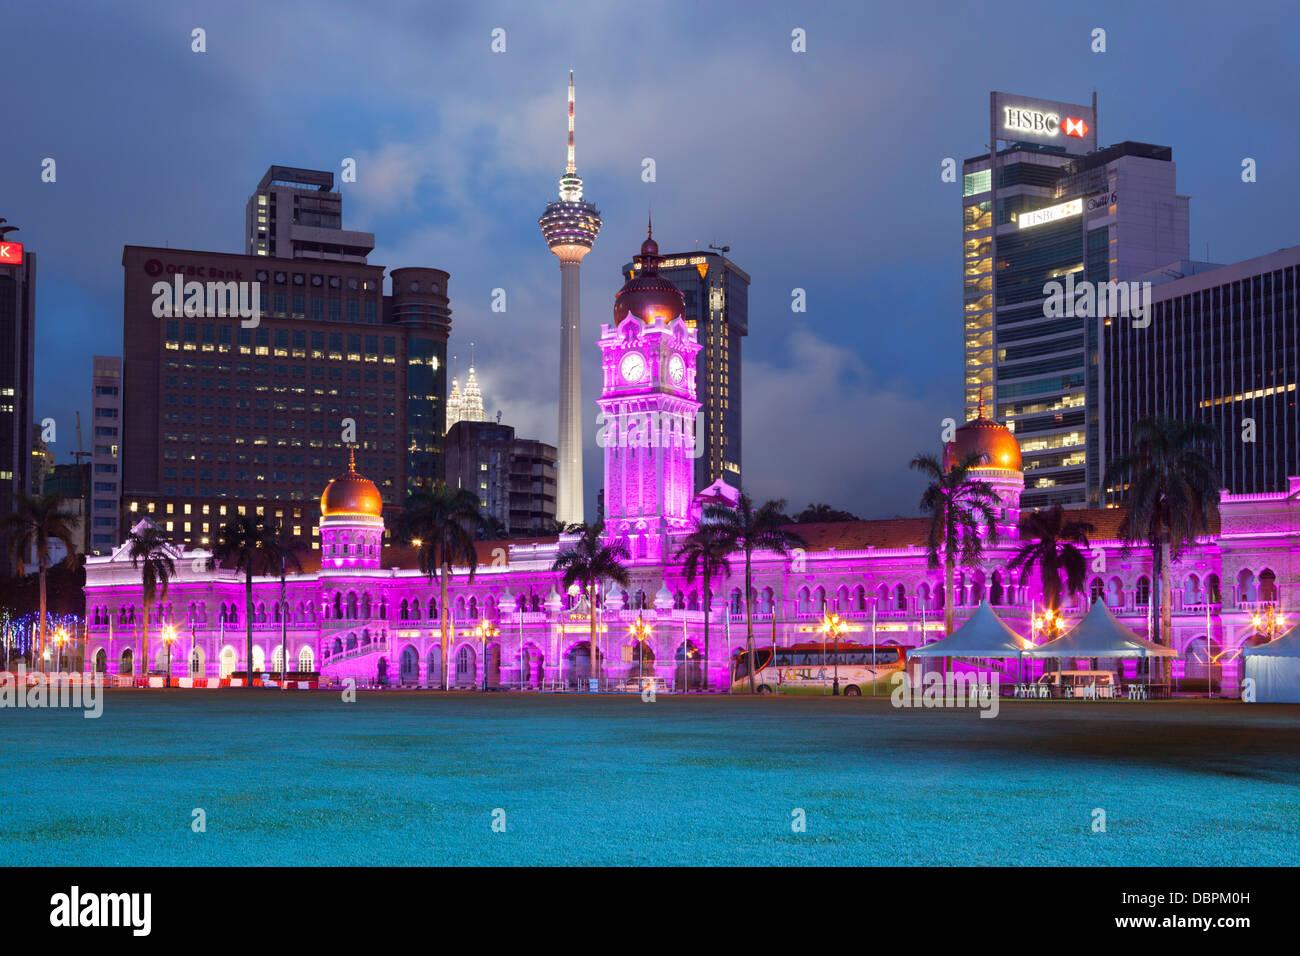 The Sultan Abdul Samad Building at night, Kuala Lumpur, Malaysia, Southeast Asia, Asia - Stock Image